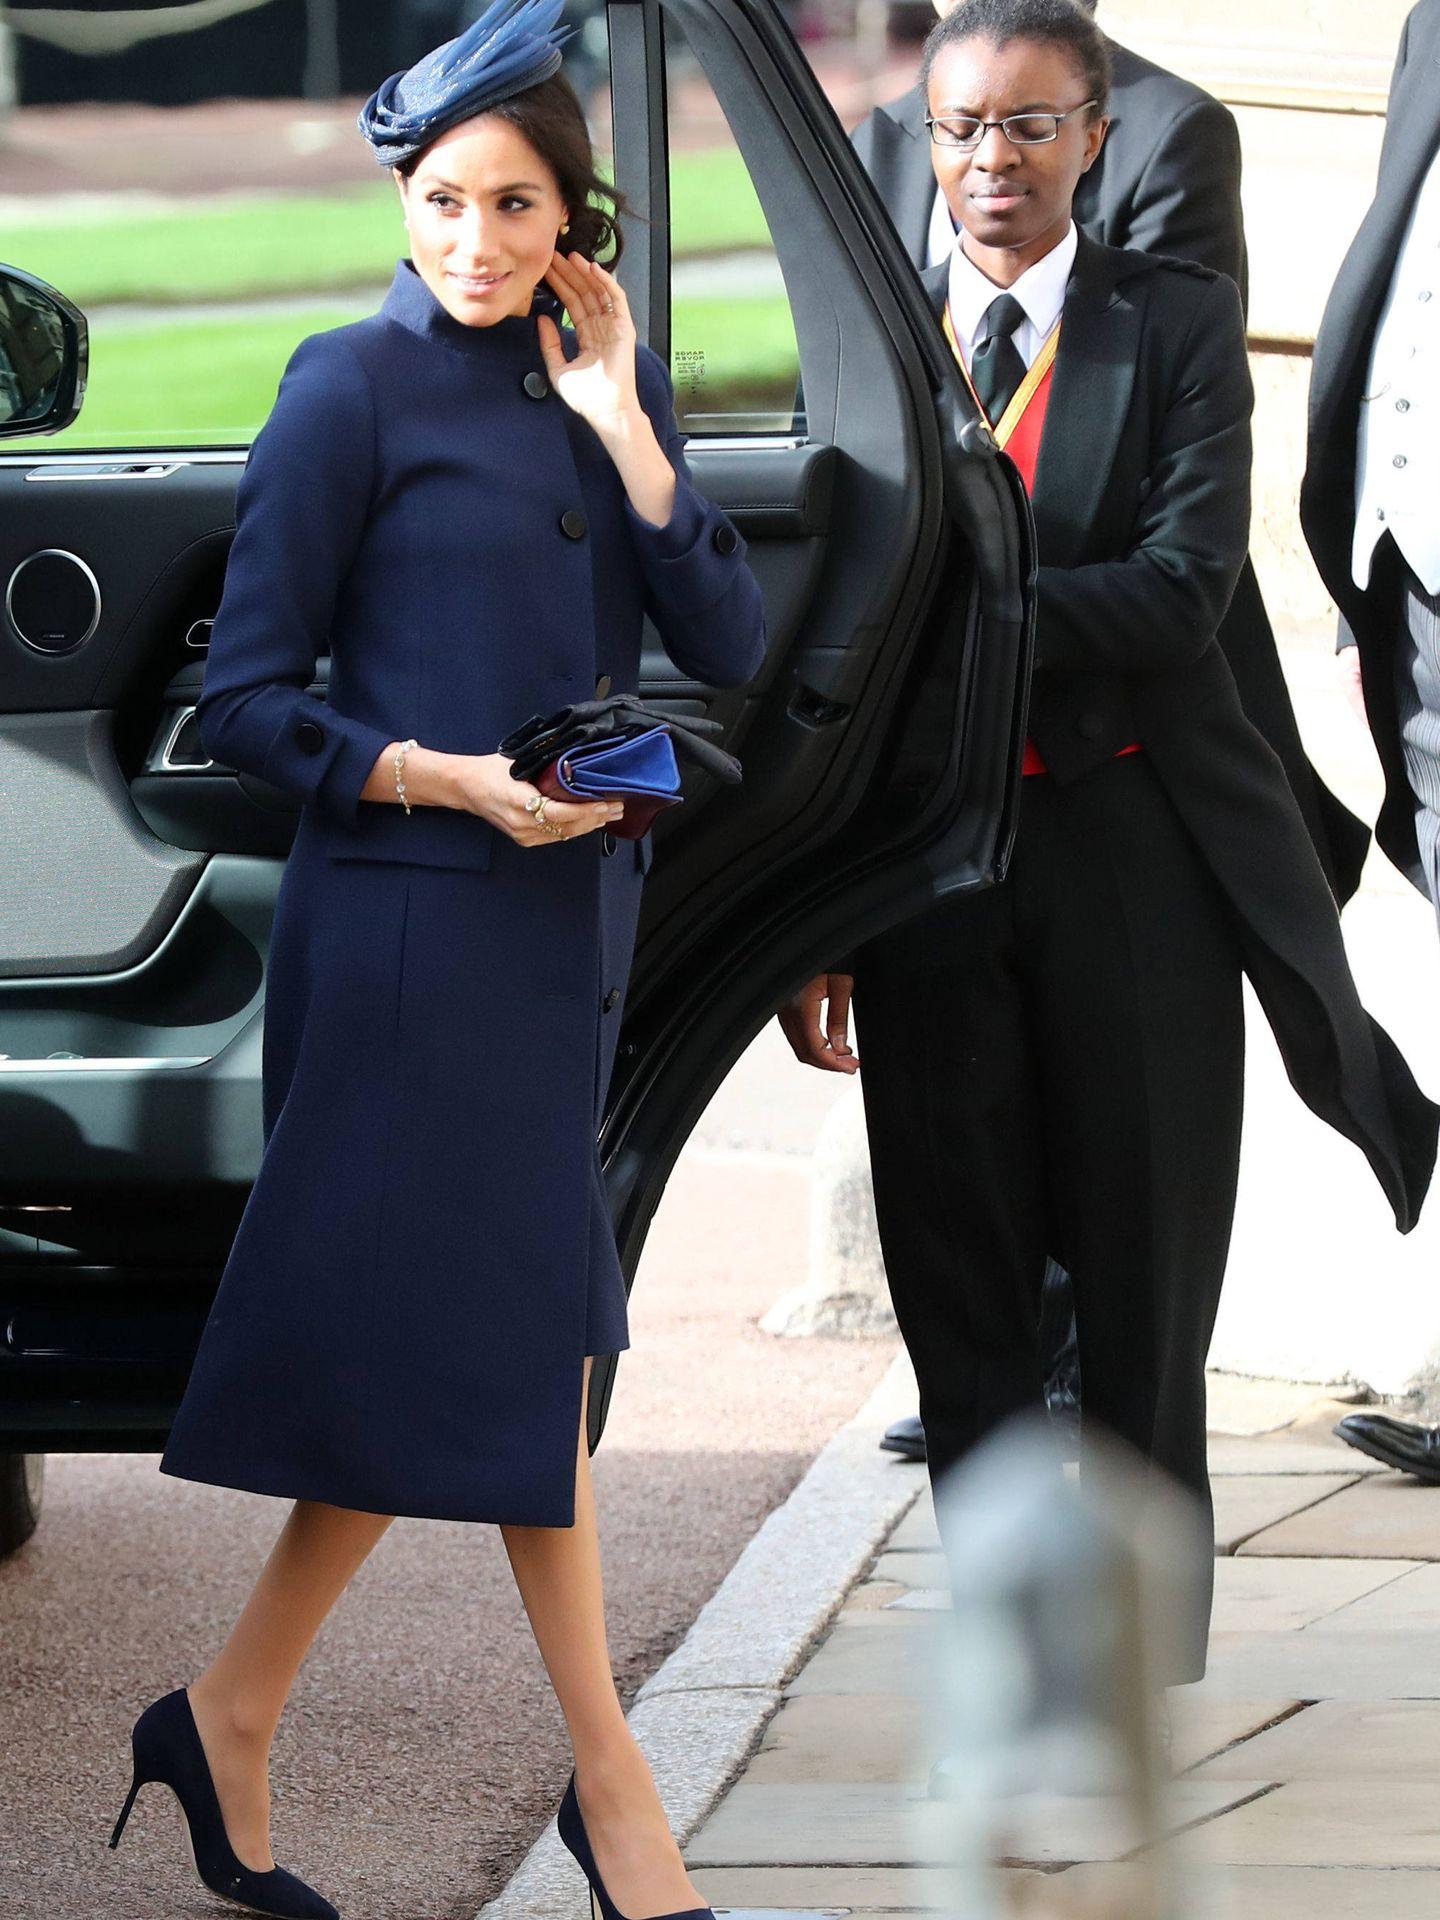 La duquesa de Sussex. (Getty)